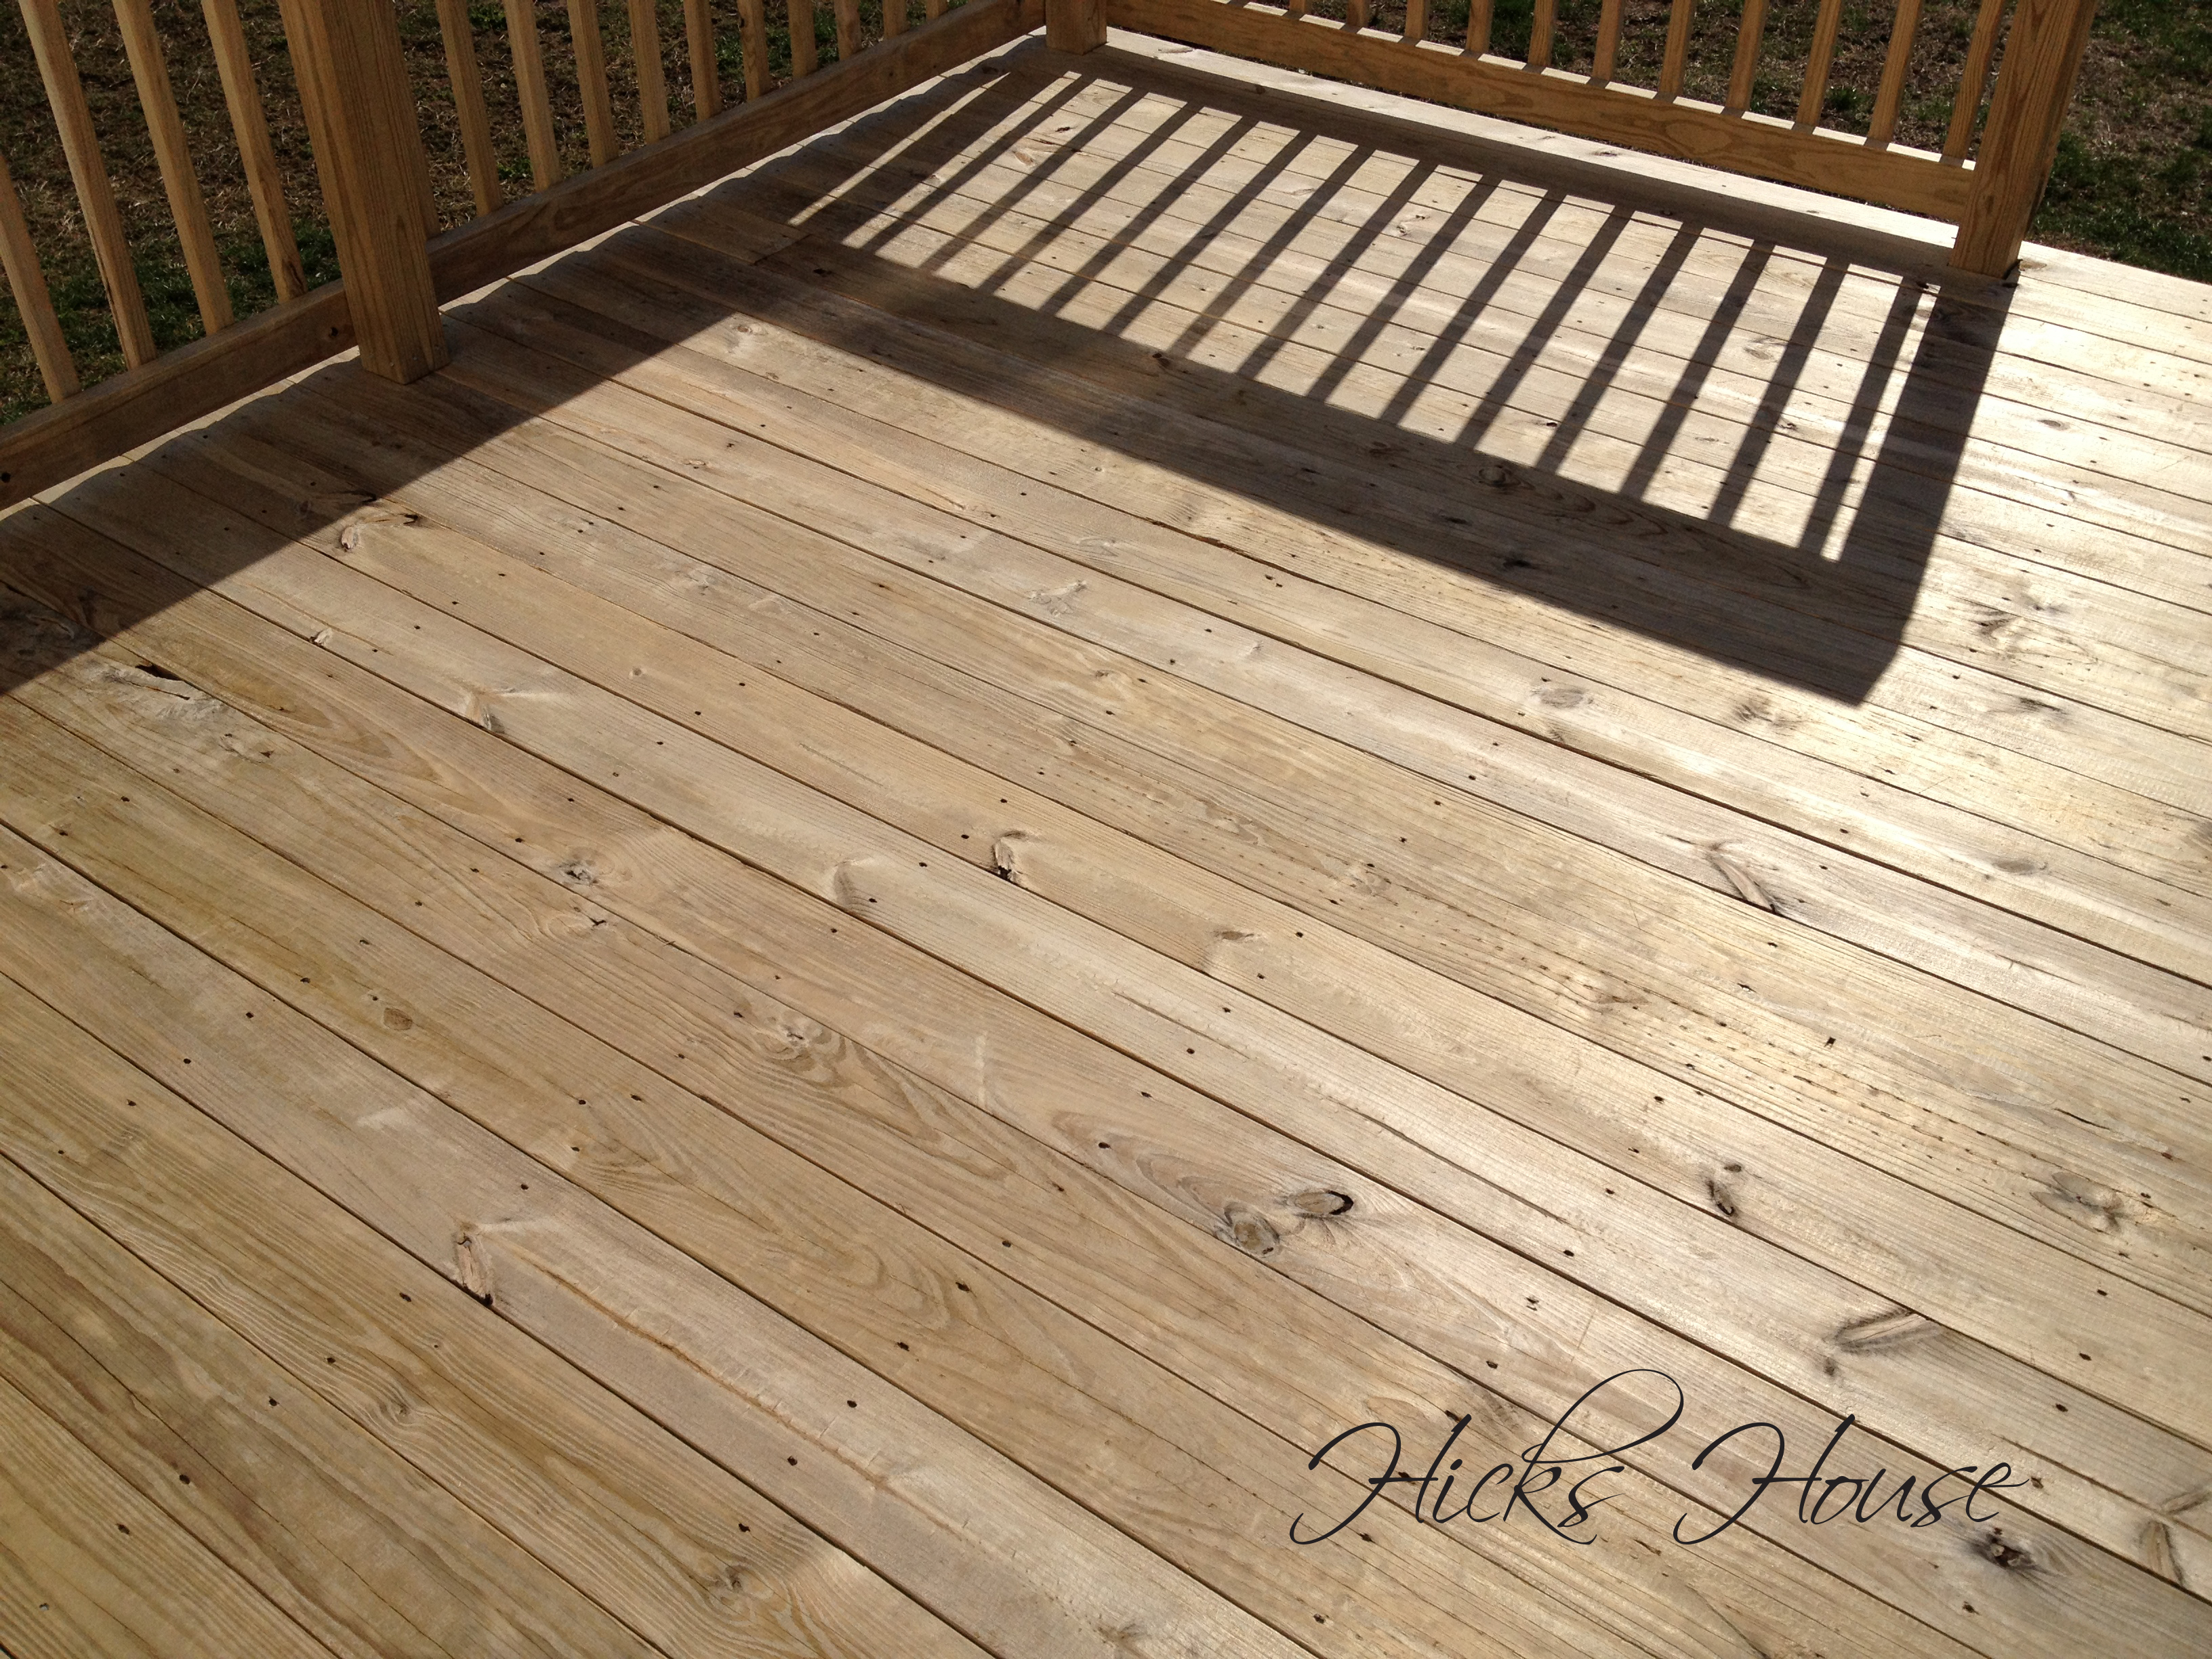 Defy Deck Stain Hicks House